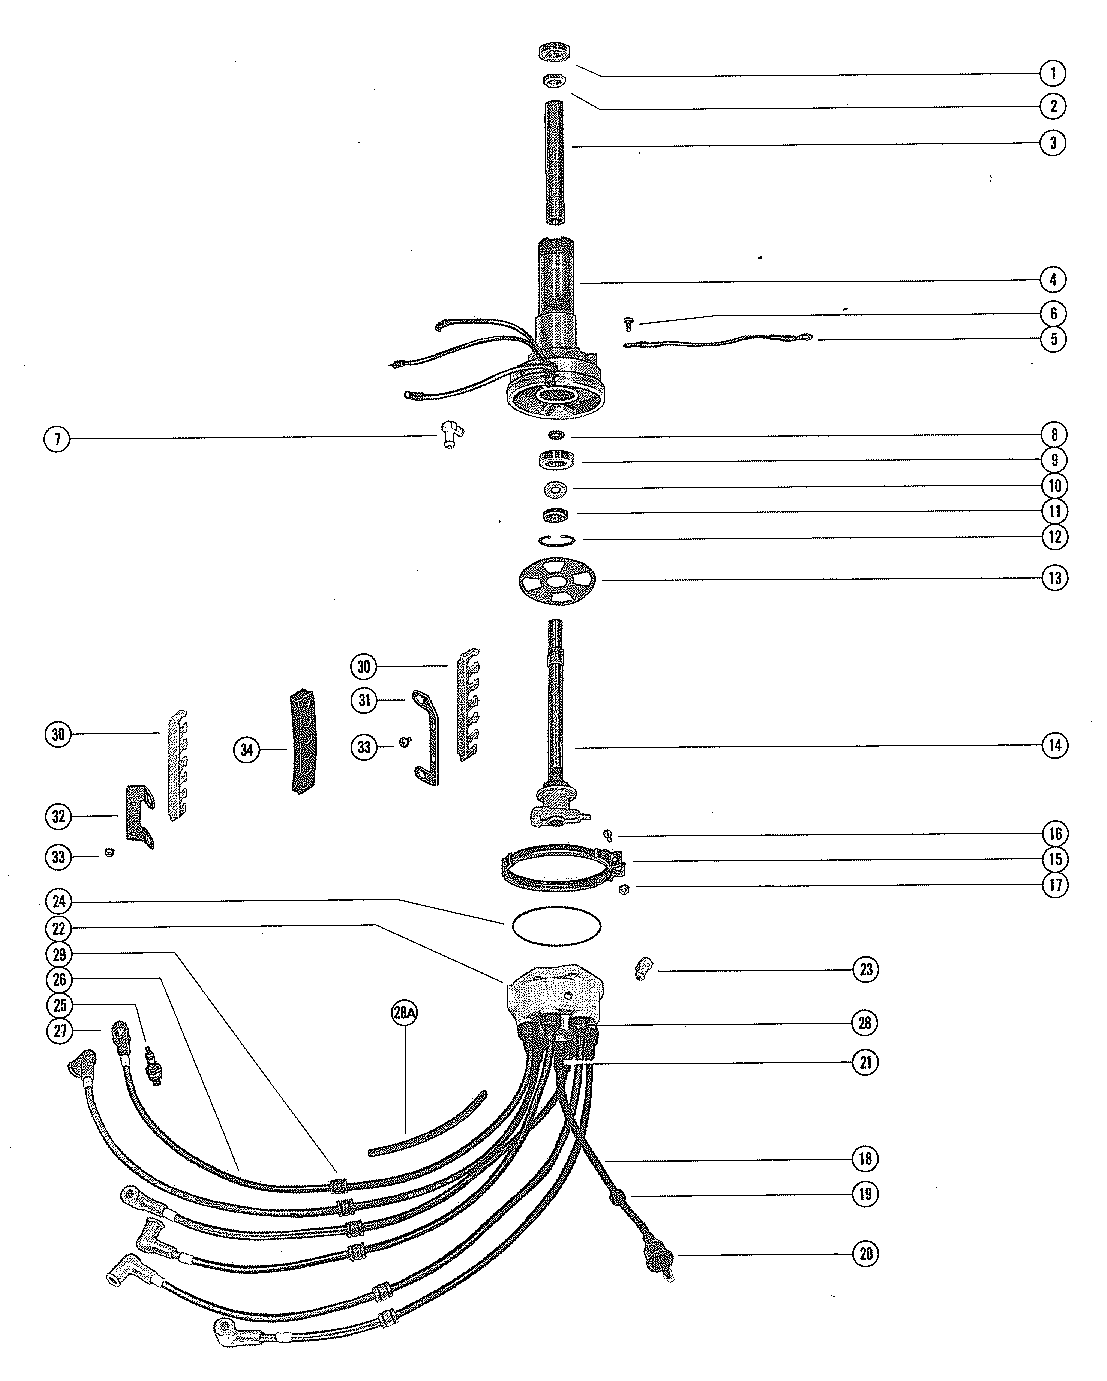 mercury mercury 1150 115 4855153 thru 5314655 distributor rh vansoutboardparts com 1978 mercury 1150 wiring diagram 1978 Mercury 115 Wiring Diagram